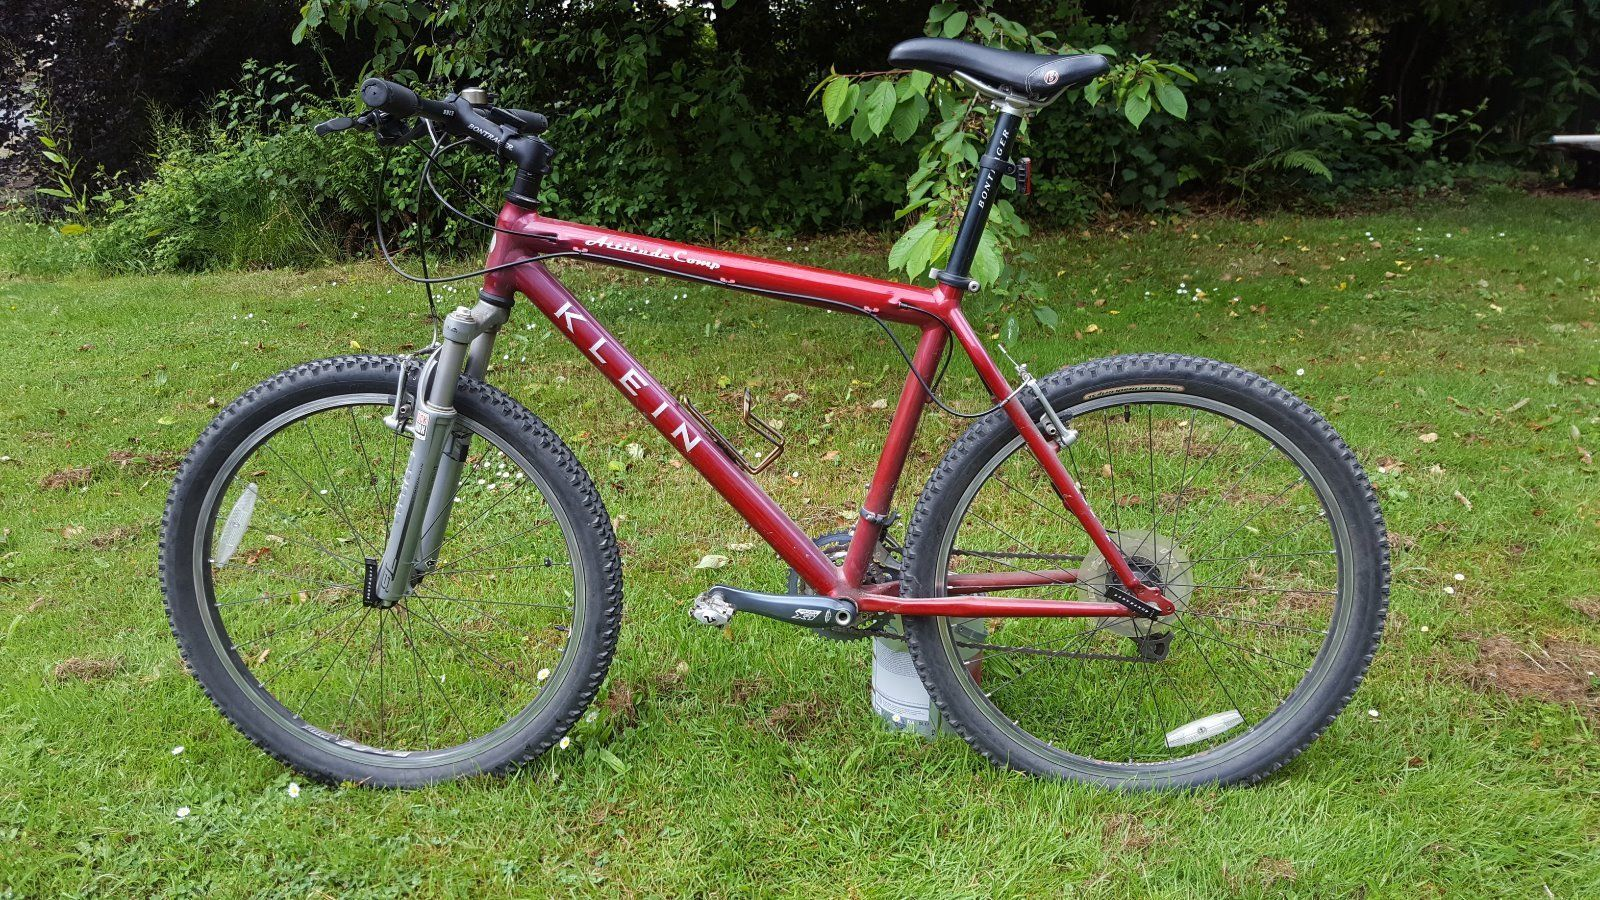 03 Klein Attitude comp MTB Best mountainbike ever? | eBay